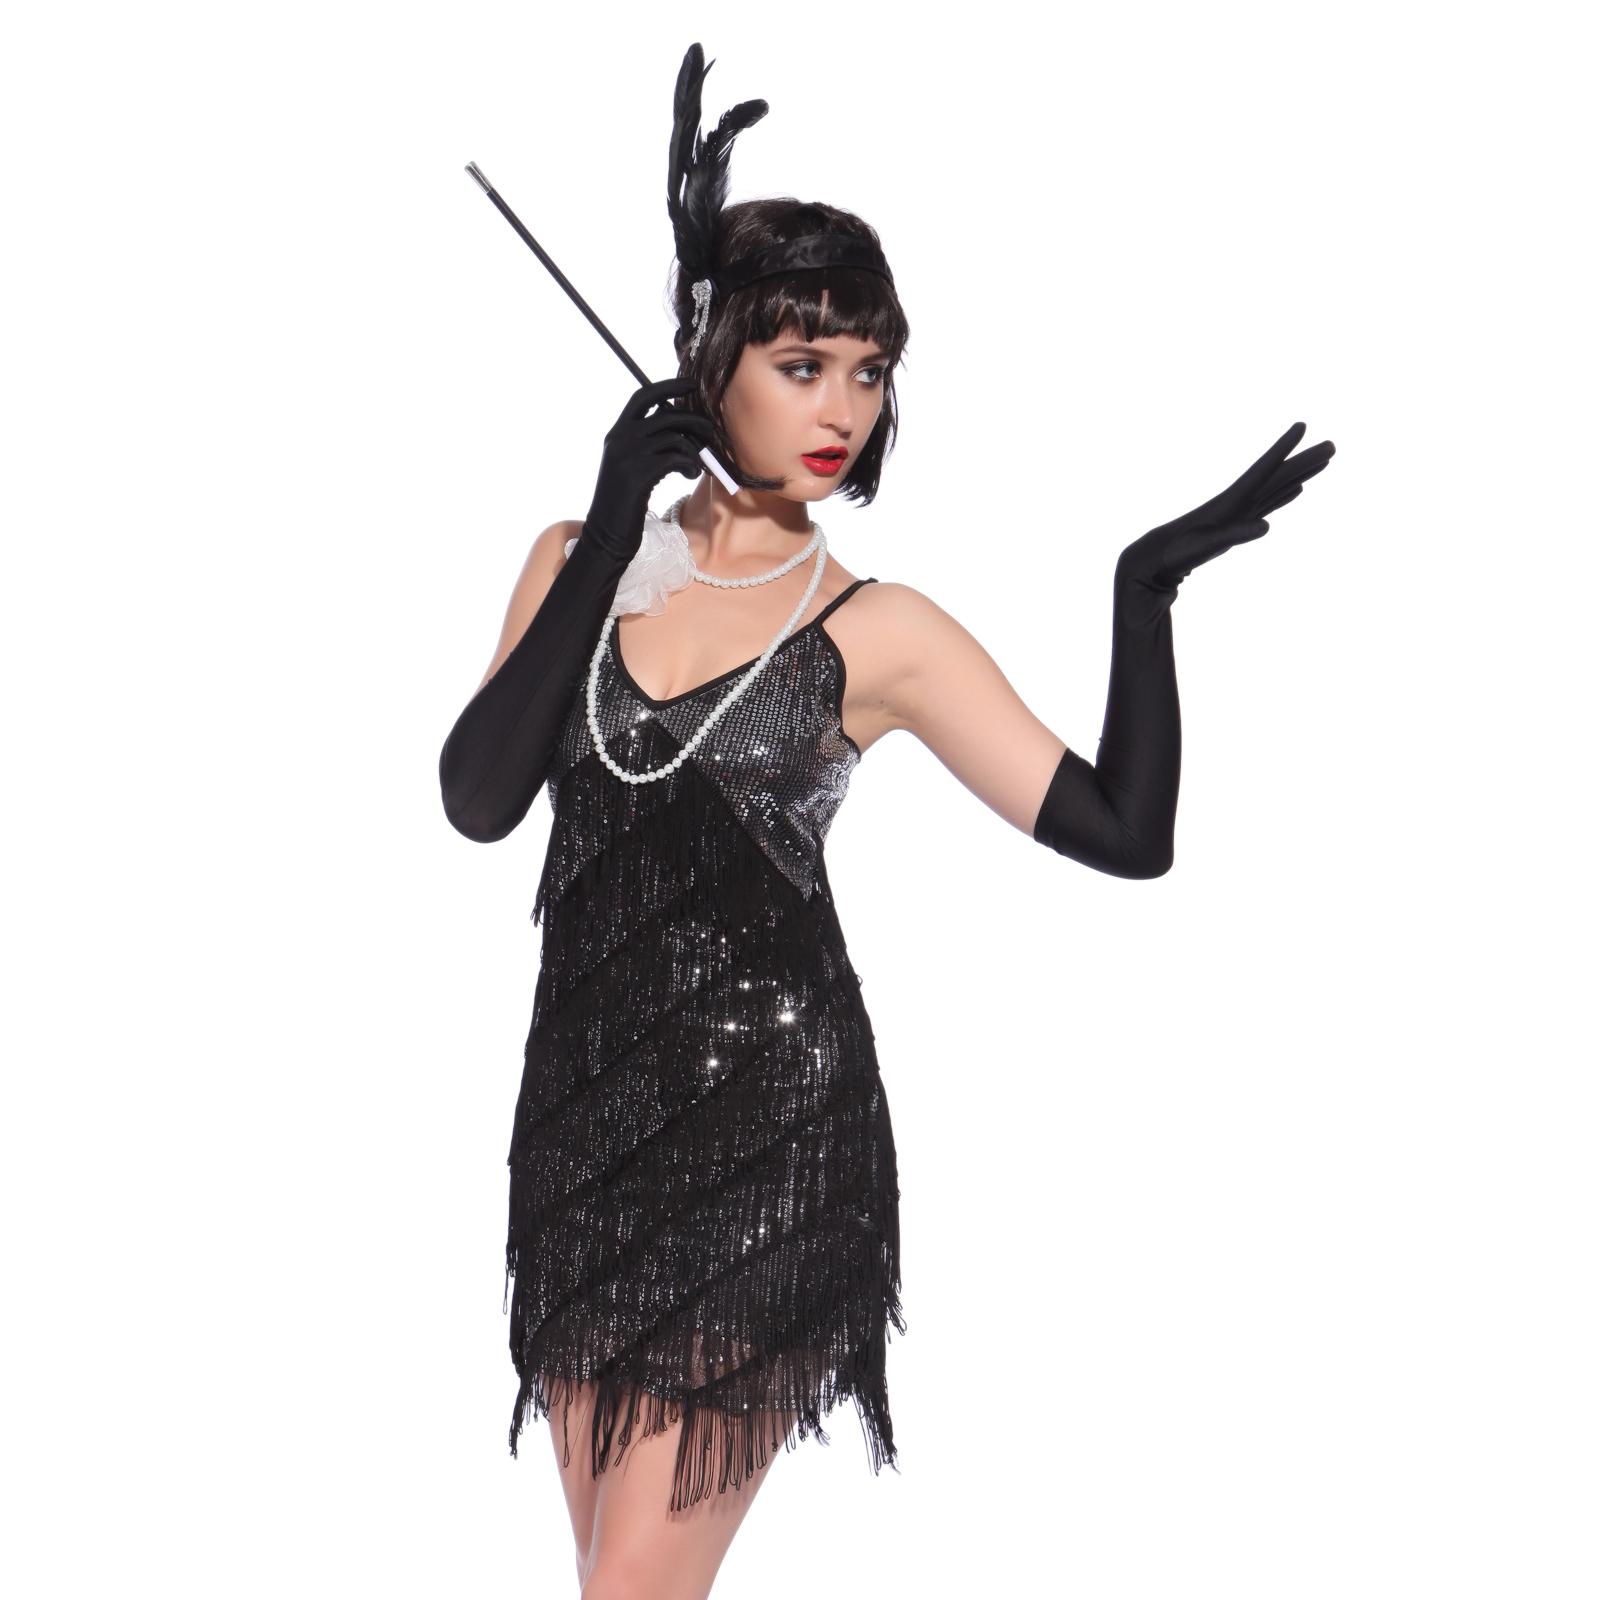 Womens 1920s flapper dress fancy dress costume adult flapper dress - Ladies Roaring 1920s Charleston Flapper Chicago Gatsby Fancy Dress Party Costume